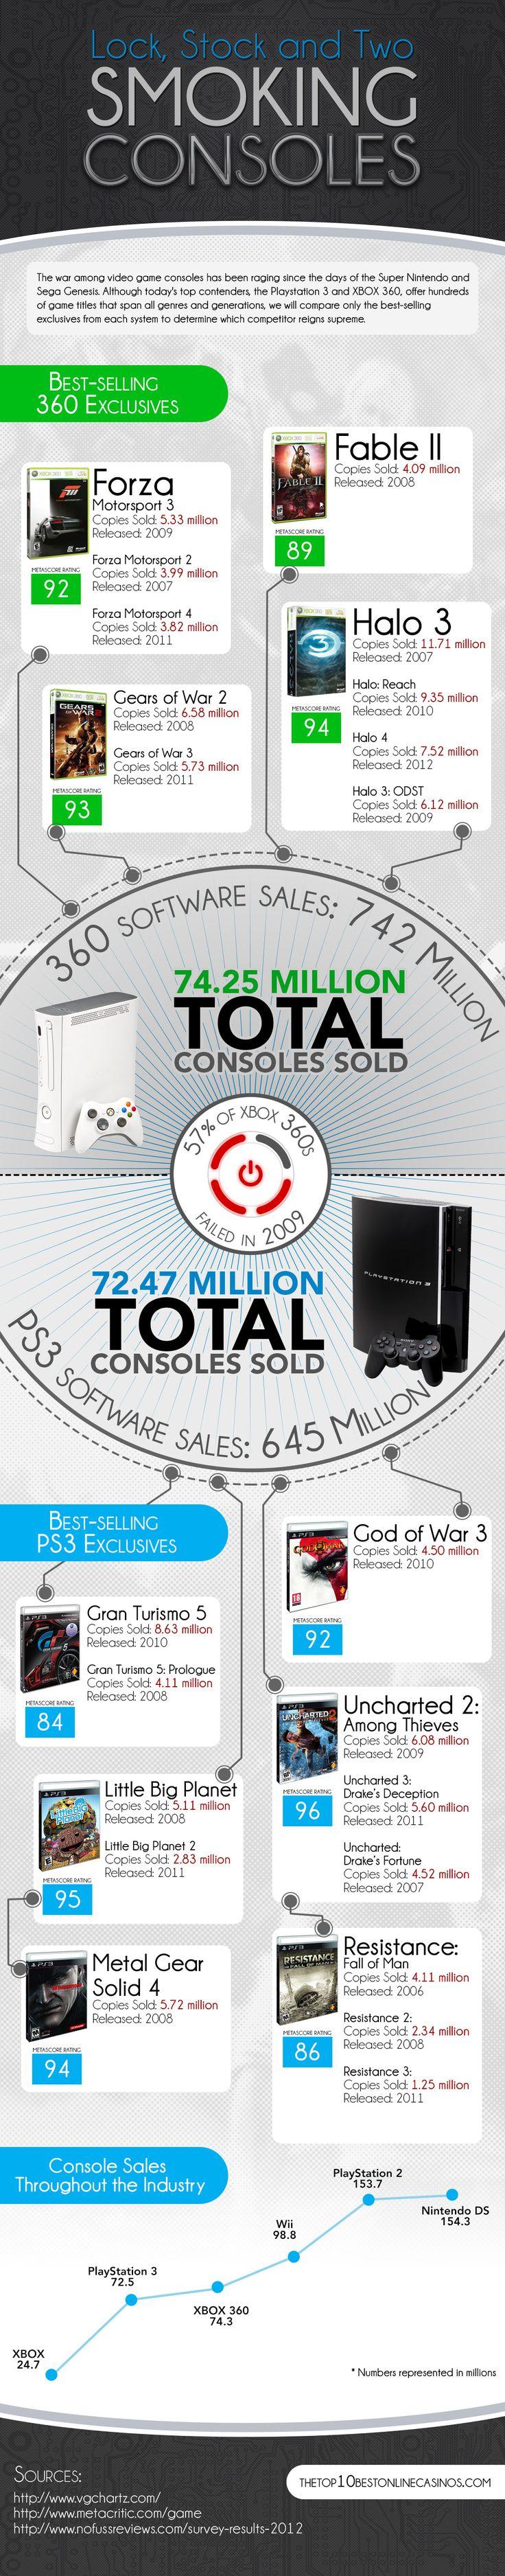 Sony and Microsoft Climb the Nintendo Hill